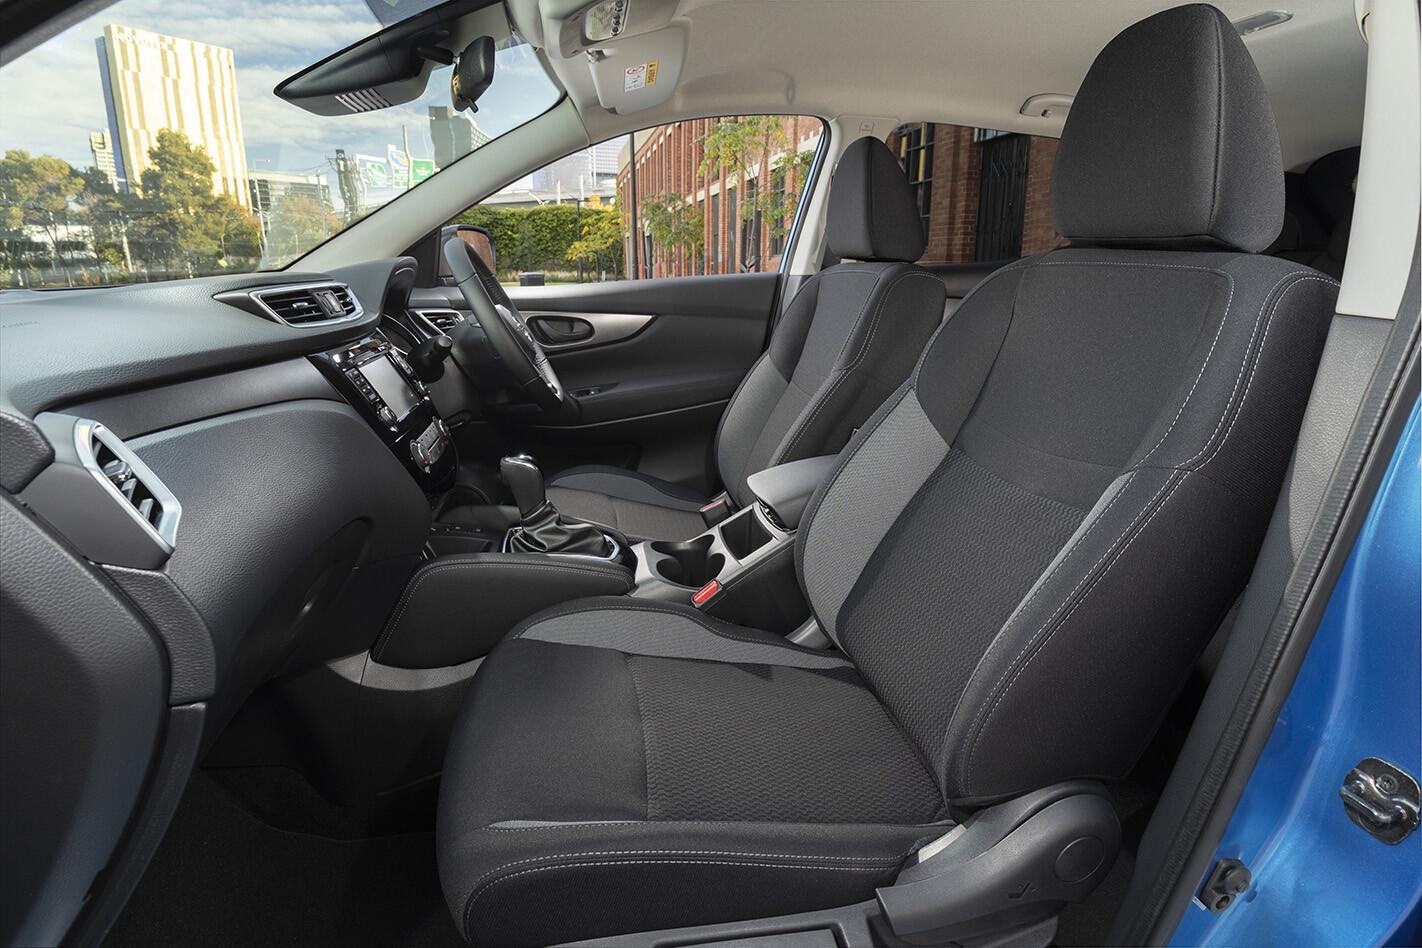 2019 Nissan Qashqai Stplus Interior Frontseats Jpg